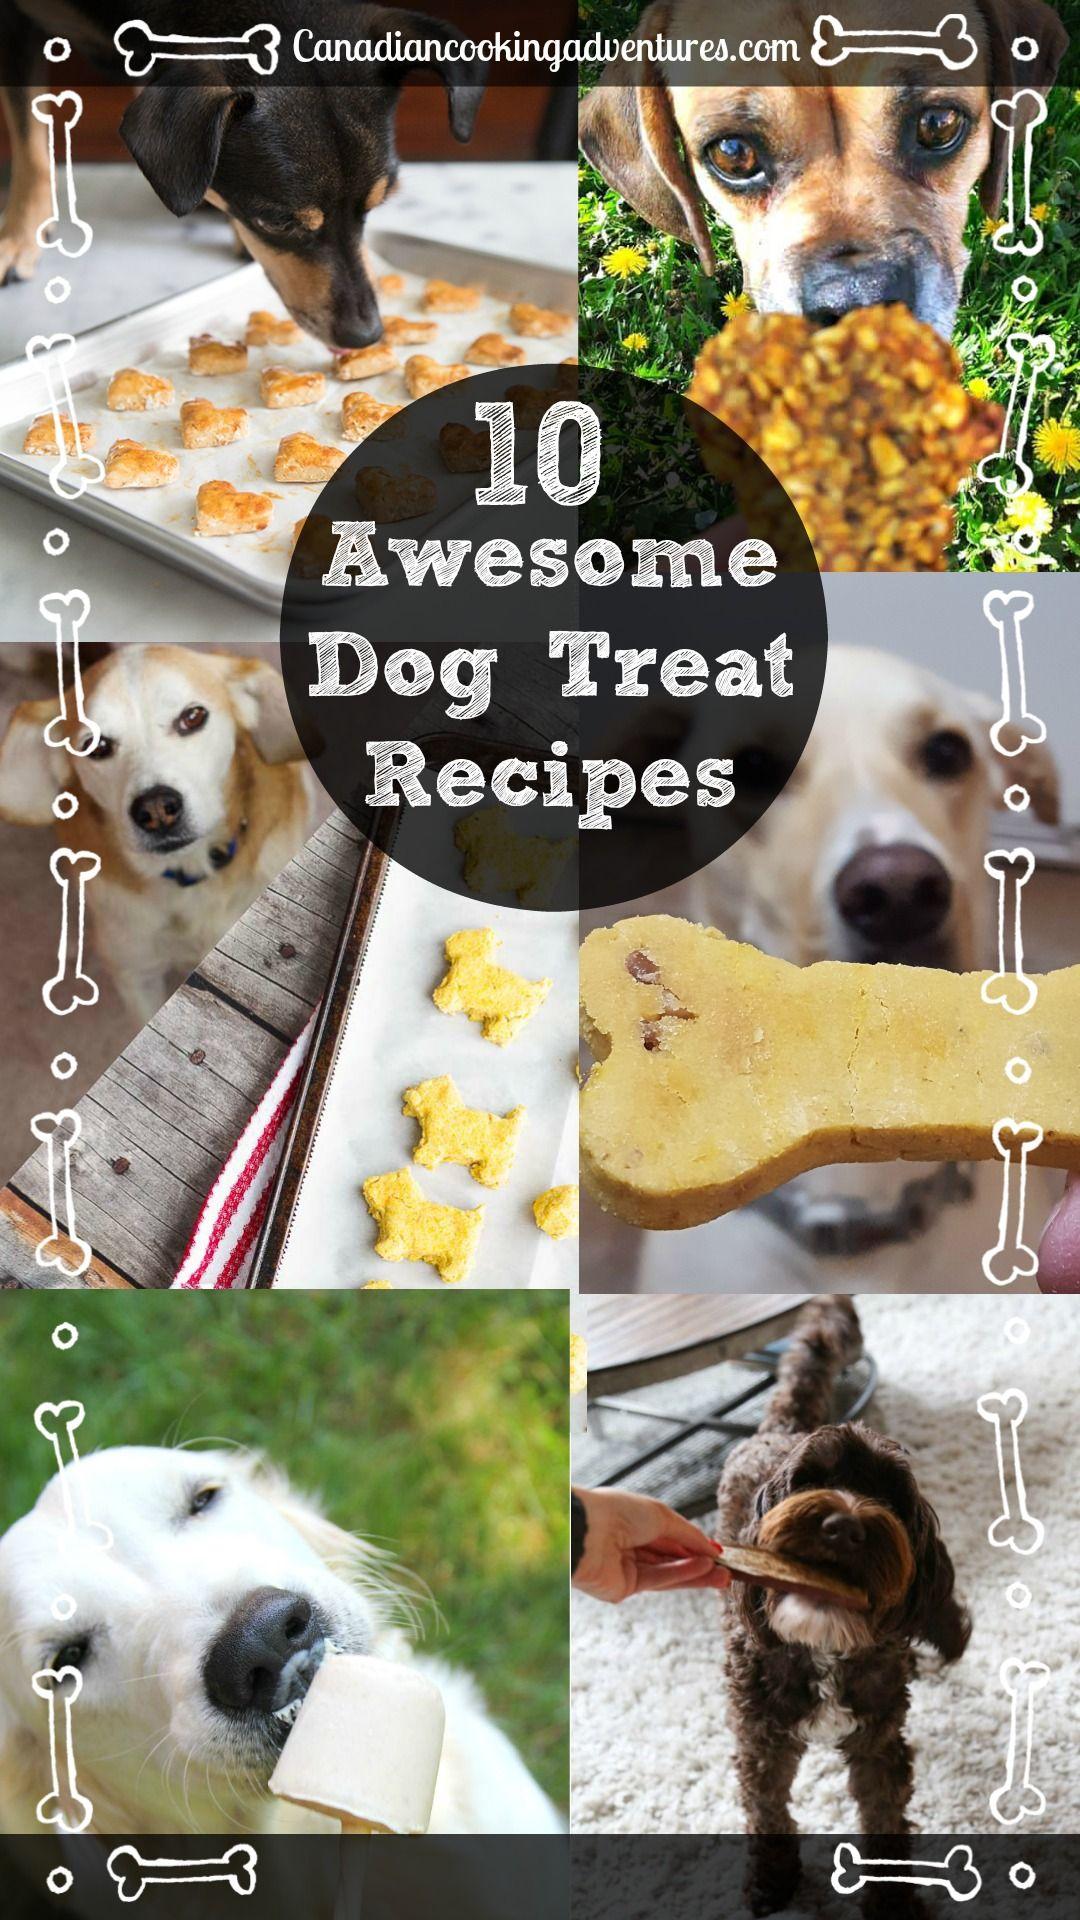 10 awesome dog treat recipes dog treat recipes dog